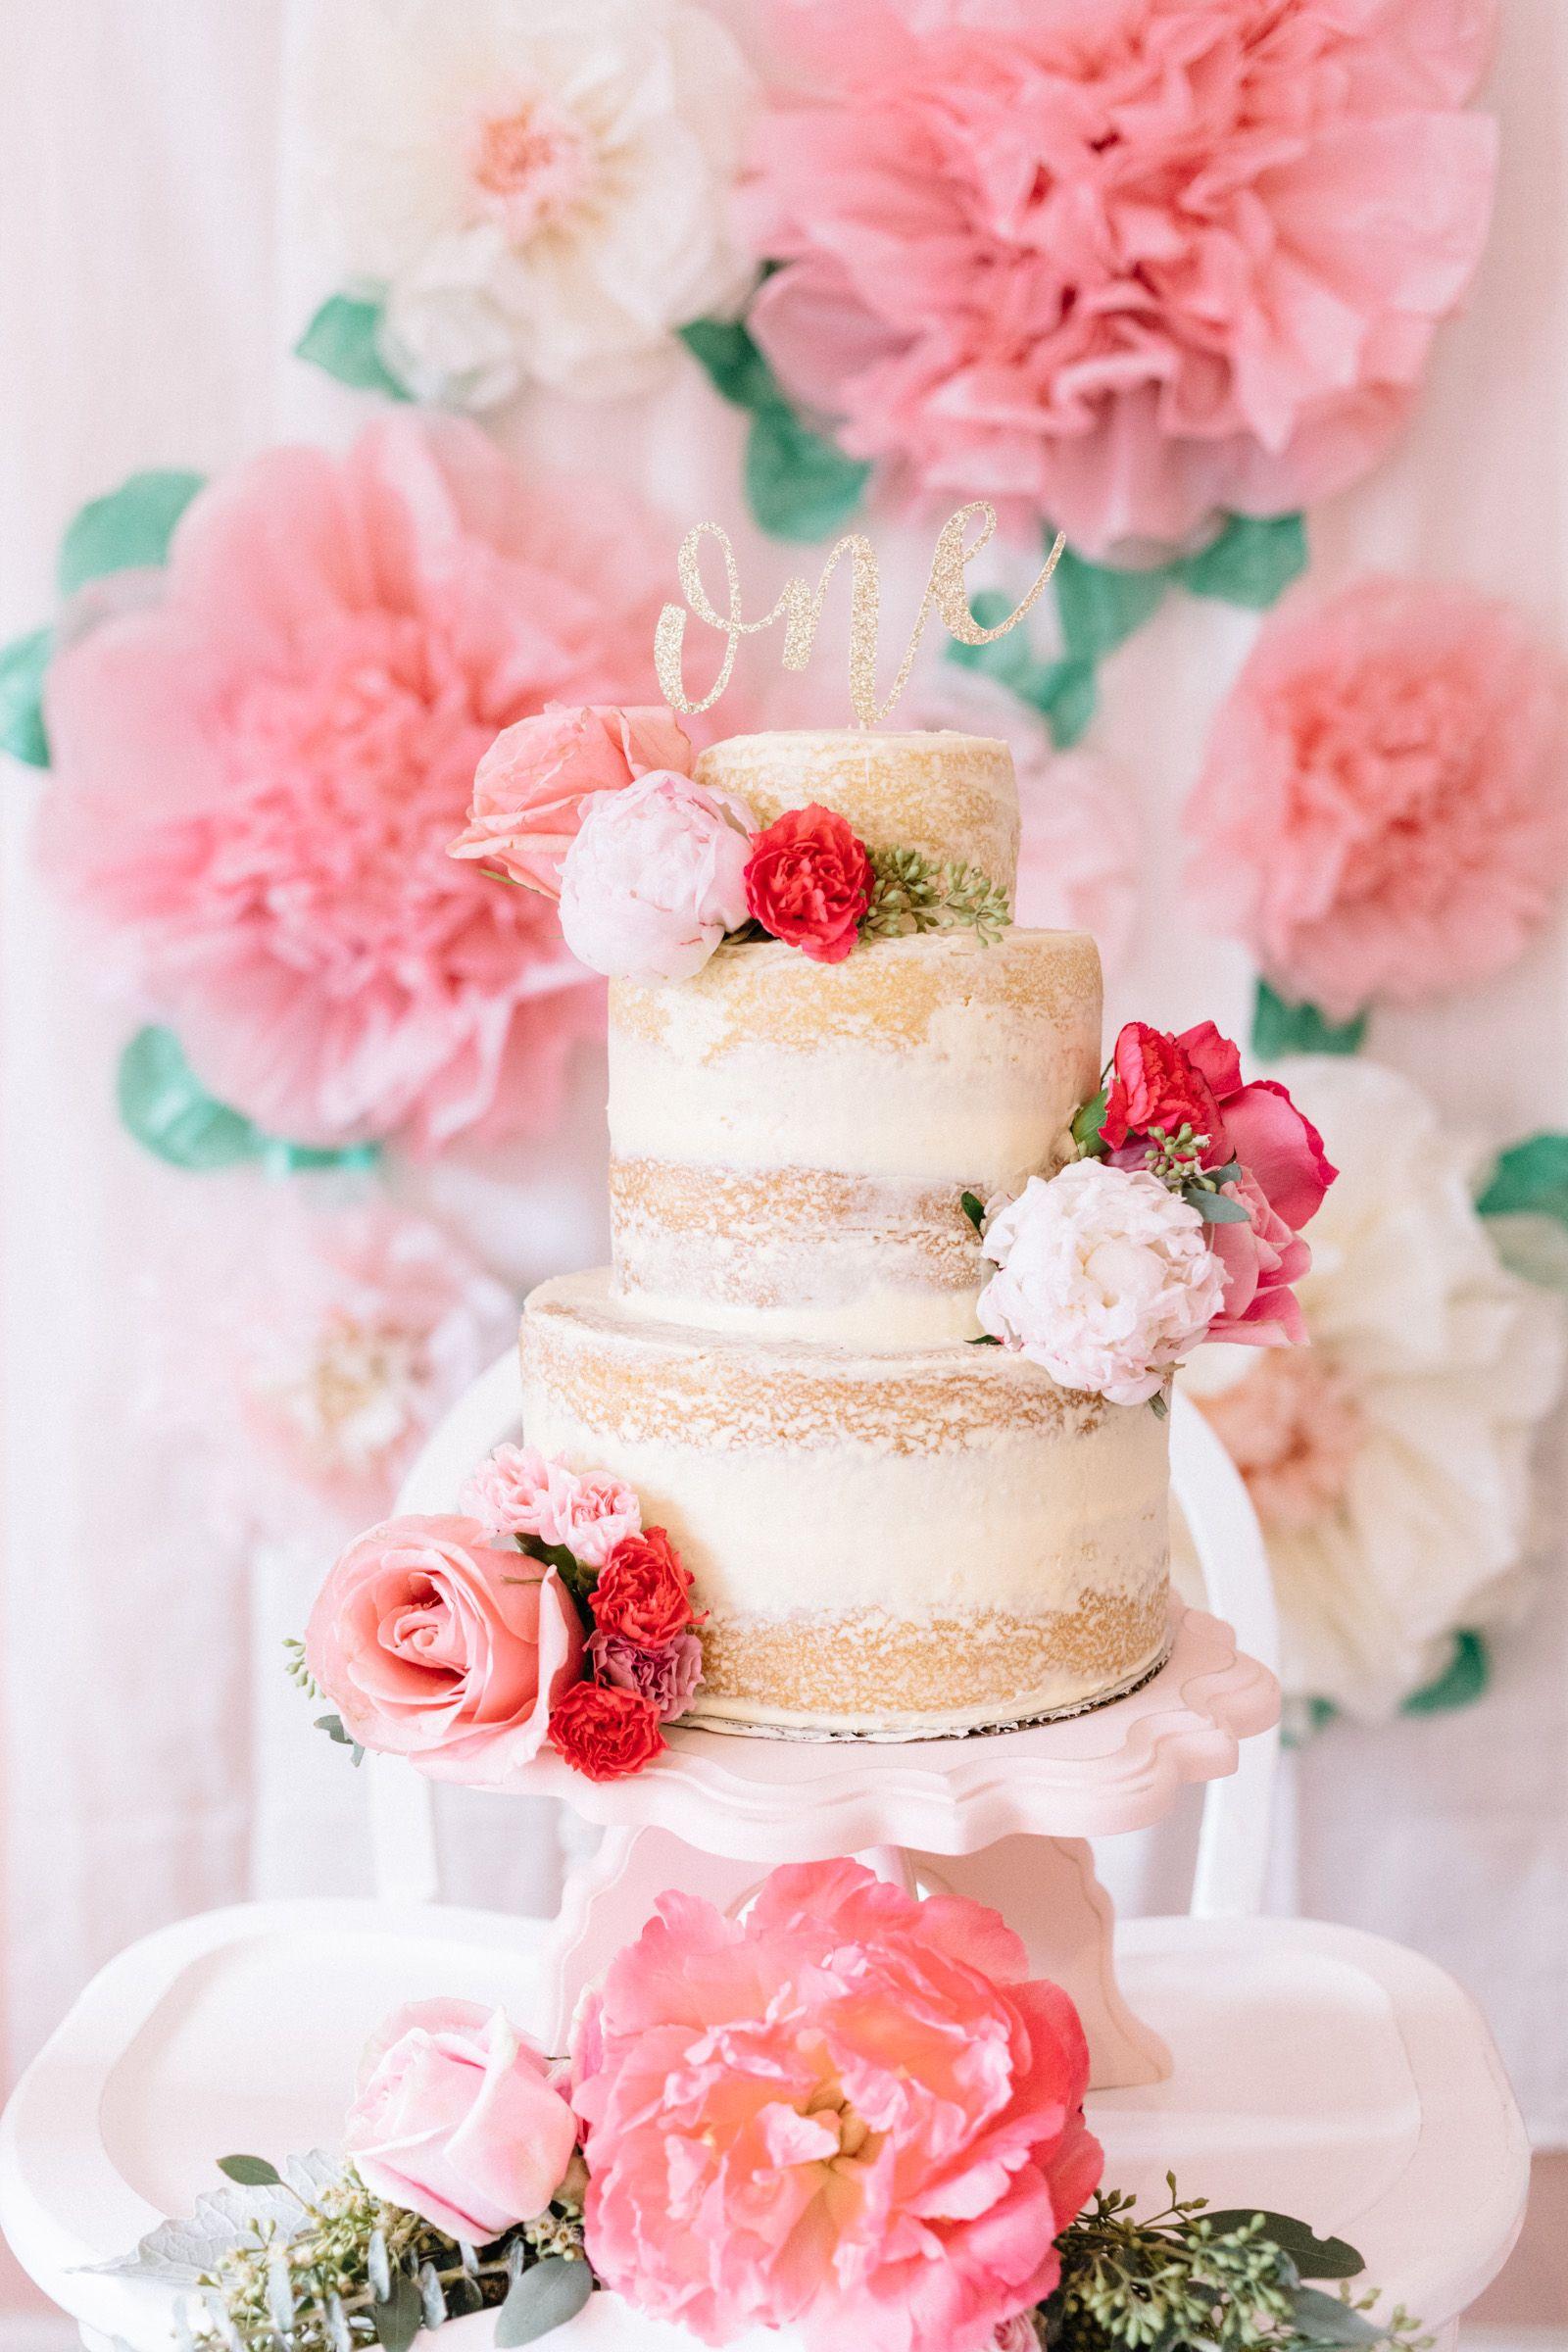 Flower Theme Birthday Party Parties Pinterest Themed Birthday